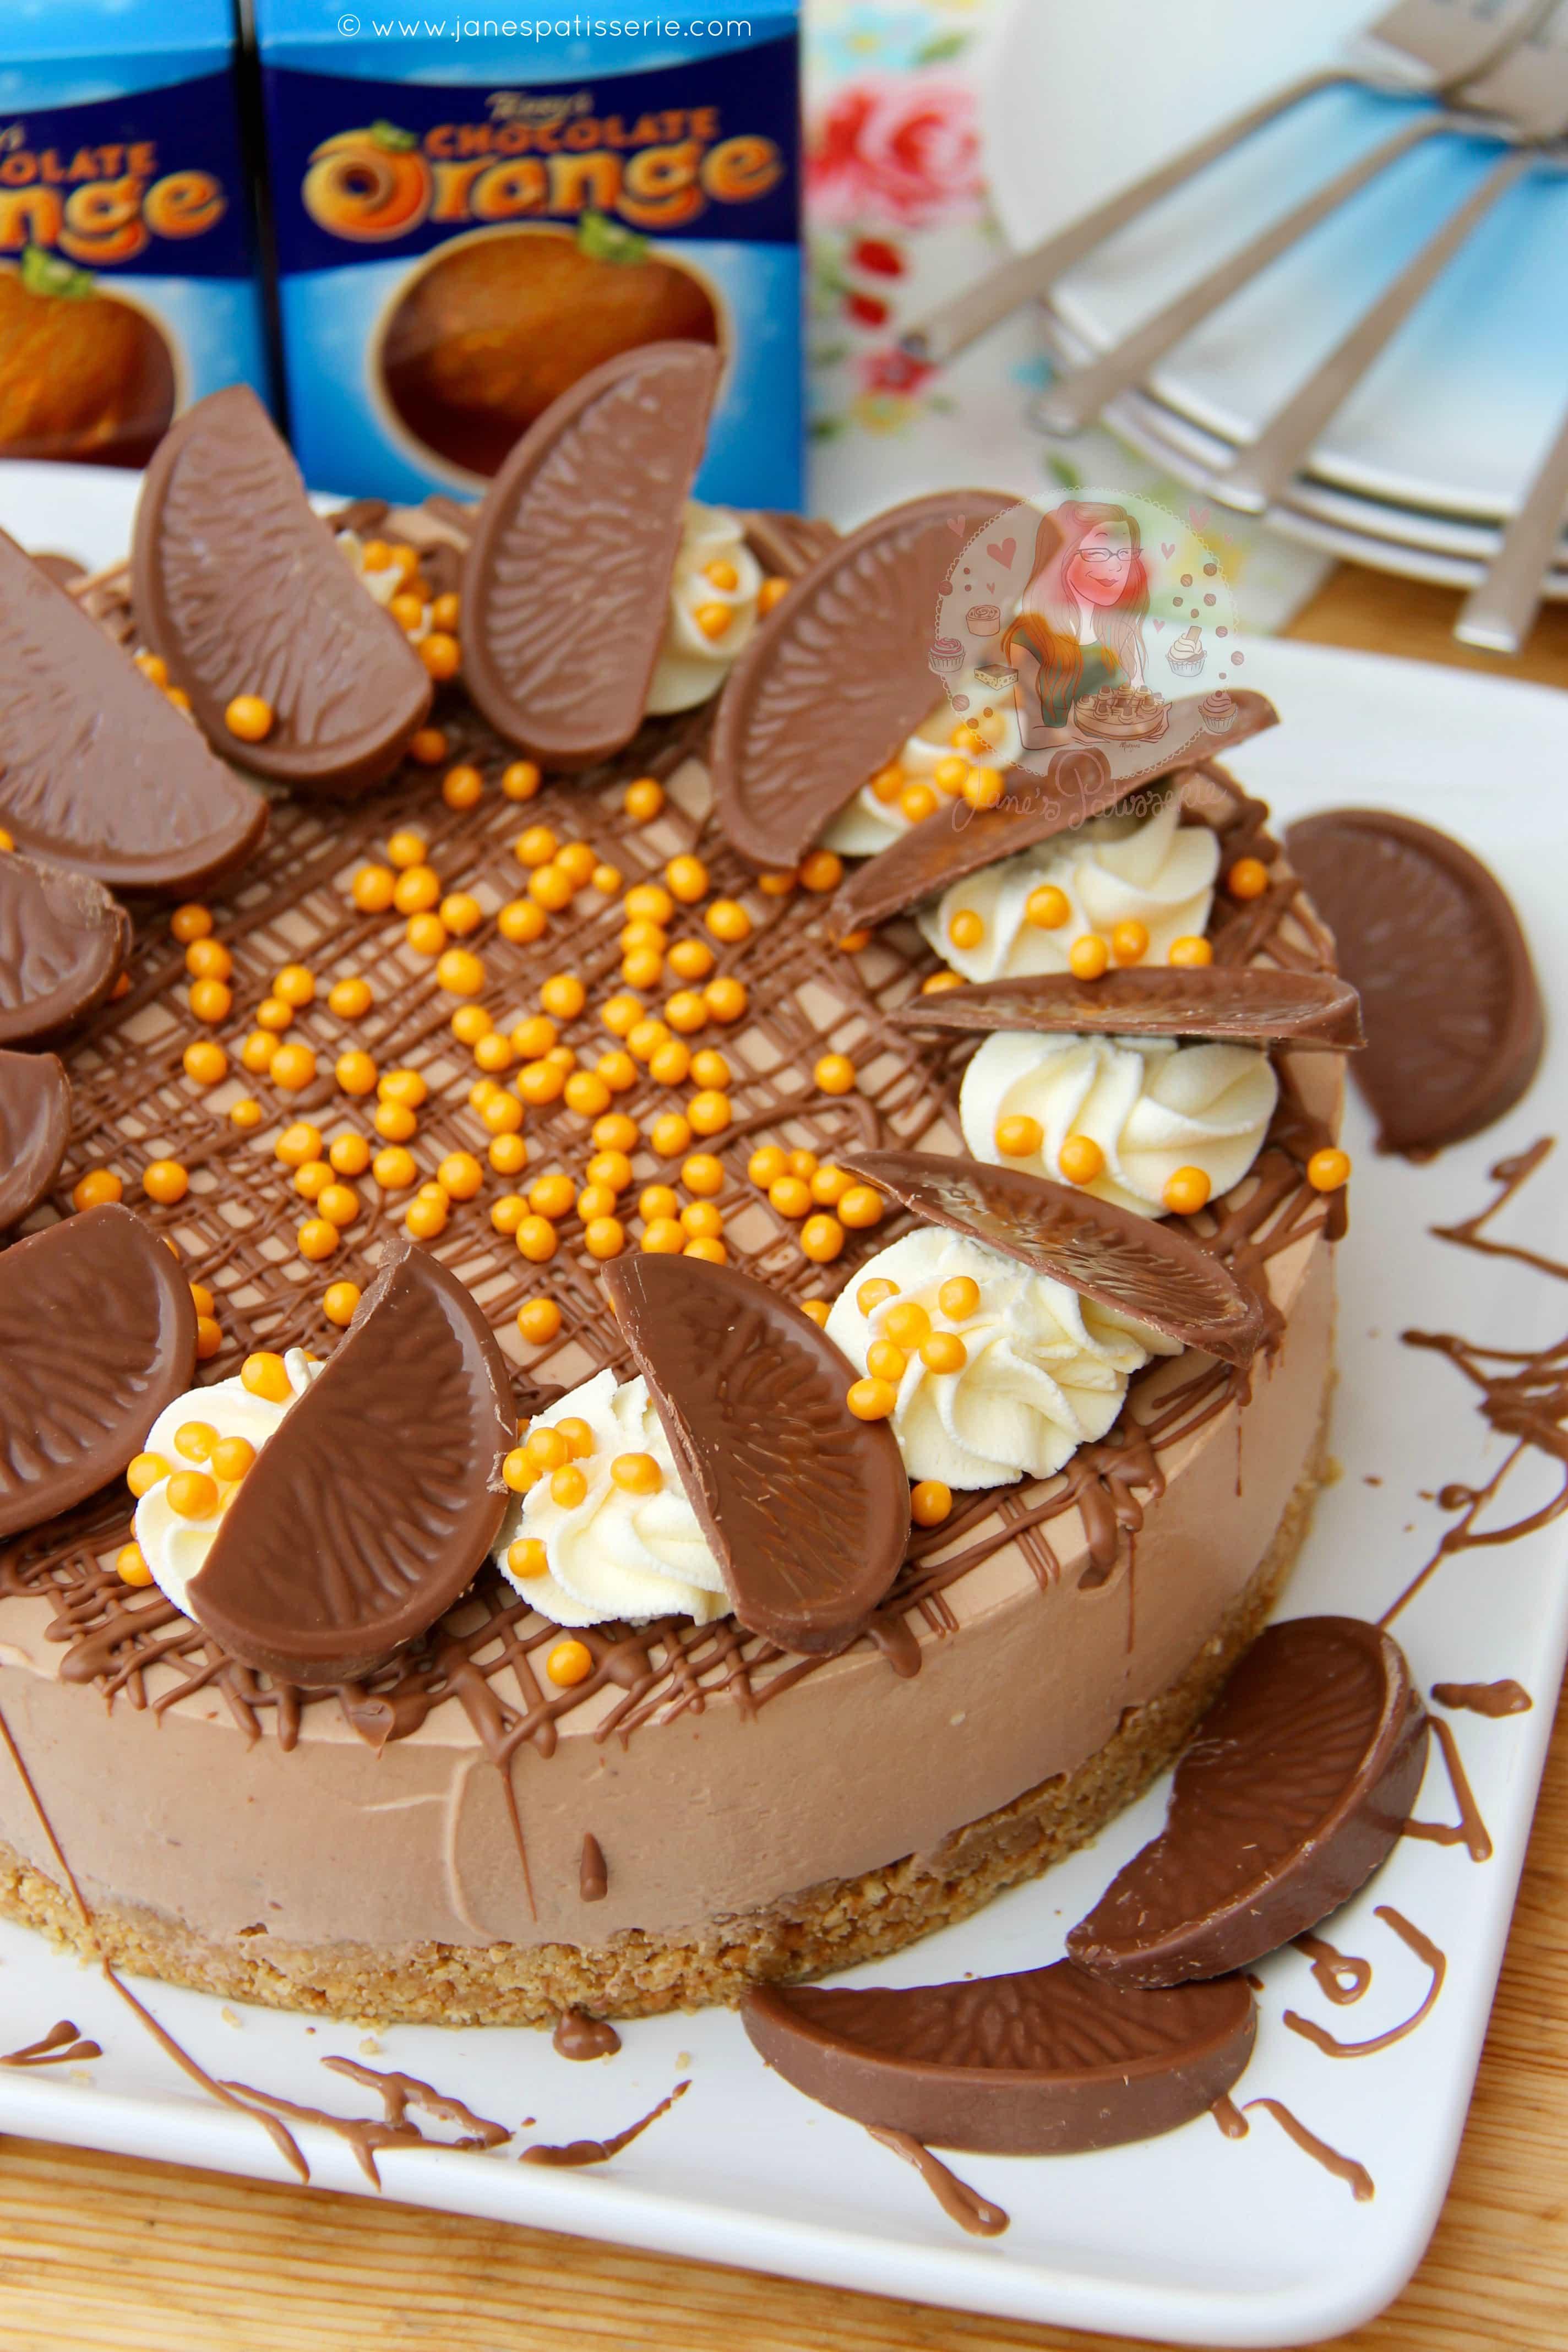 How To Bake Orange Cake